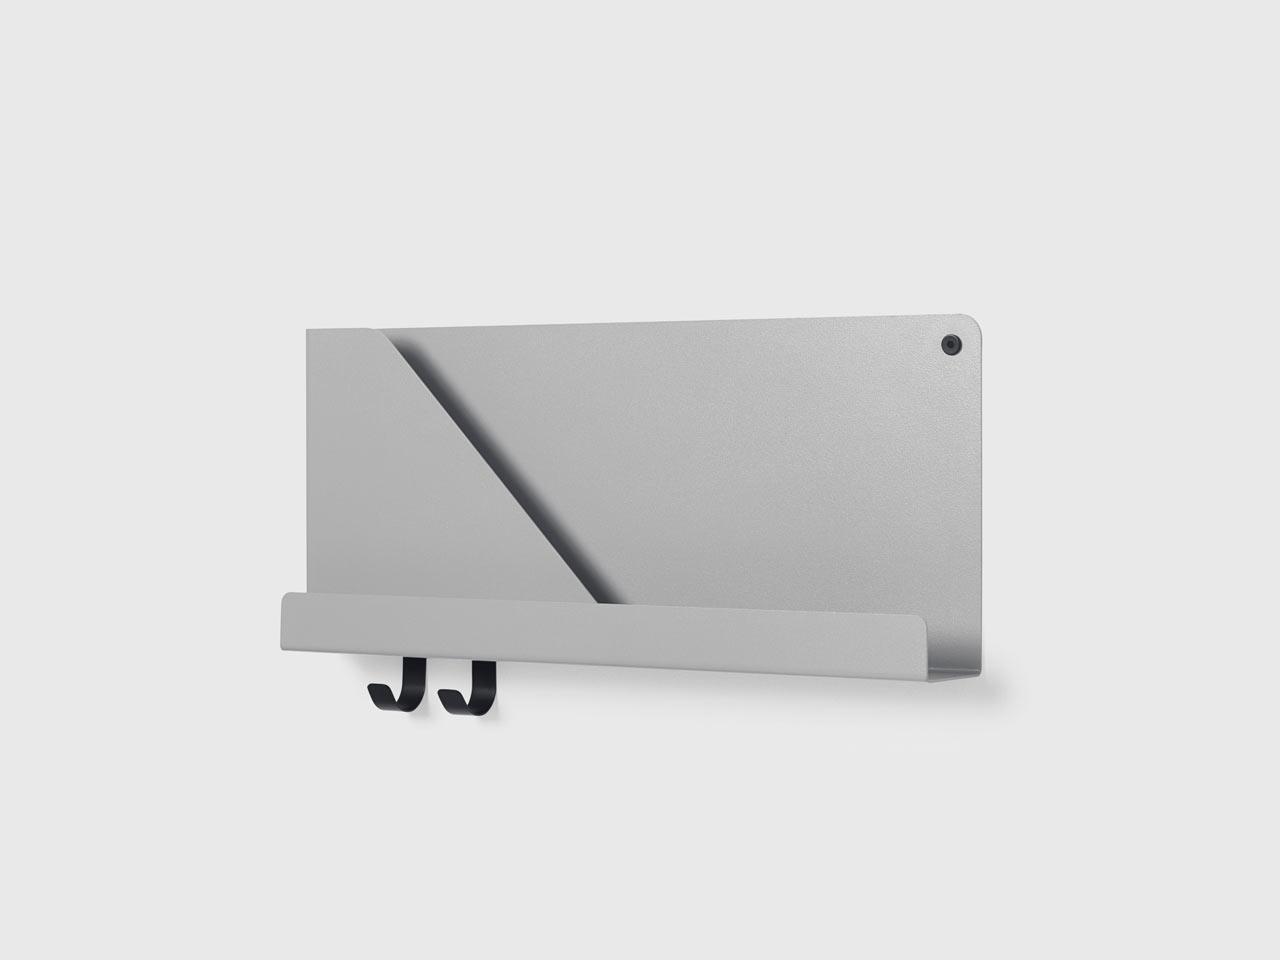 Folded-Shelf-Muuto-Johan-van-Hengel-14